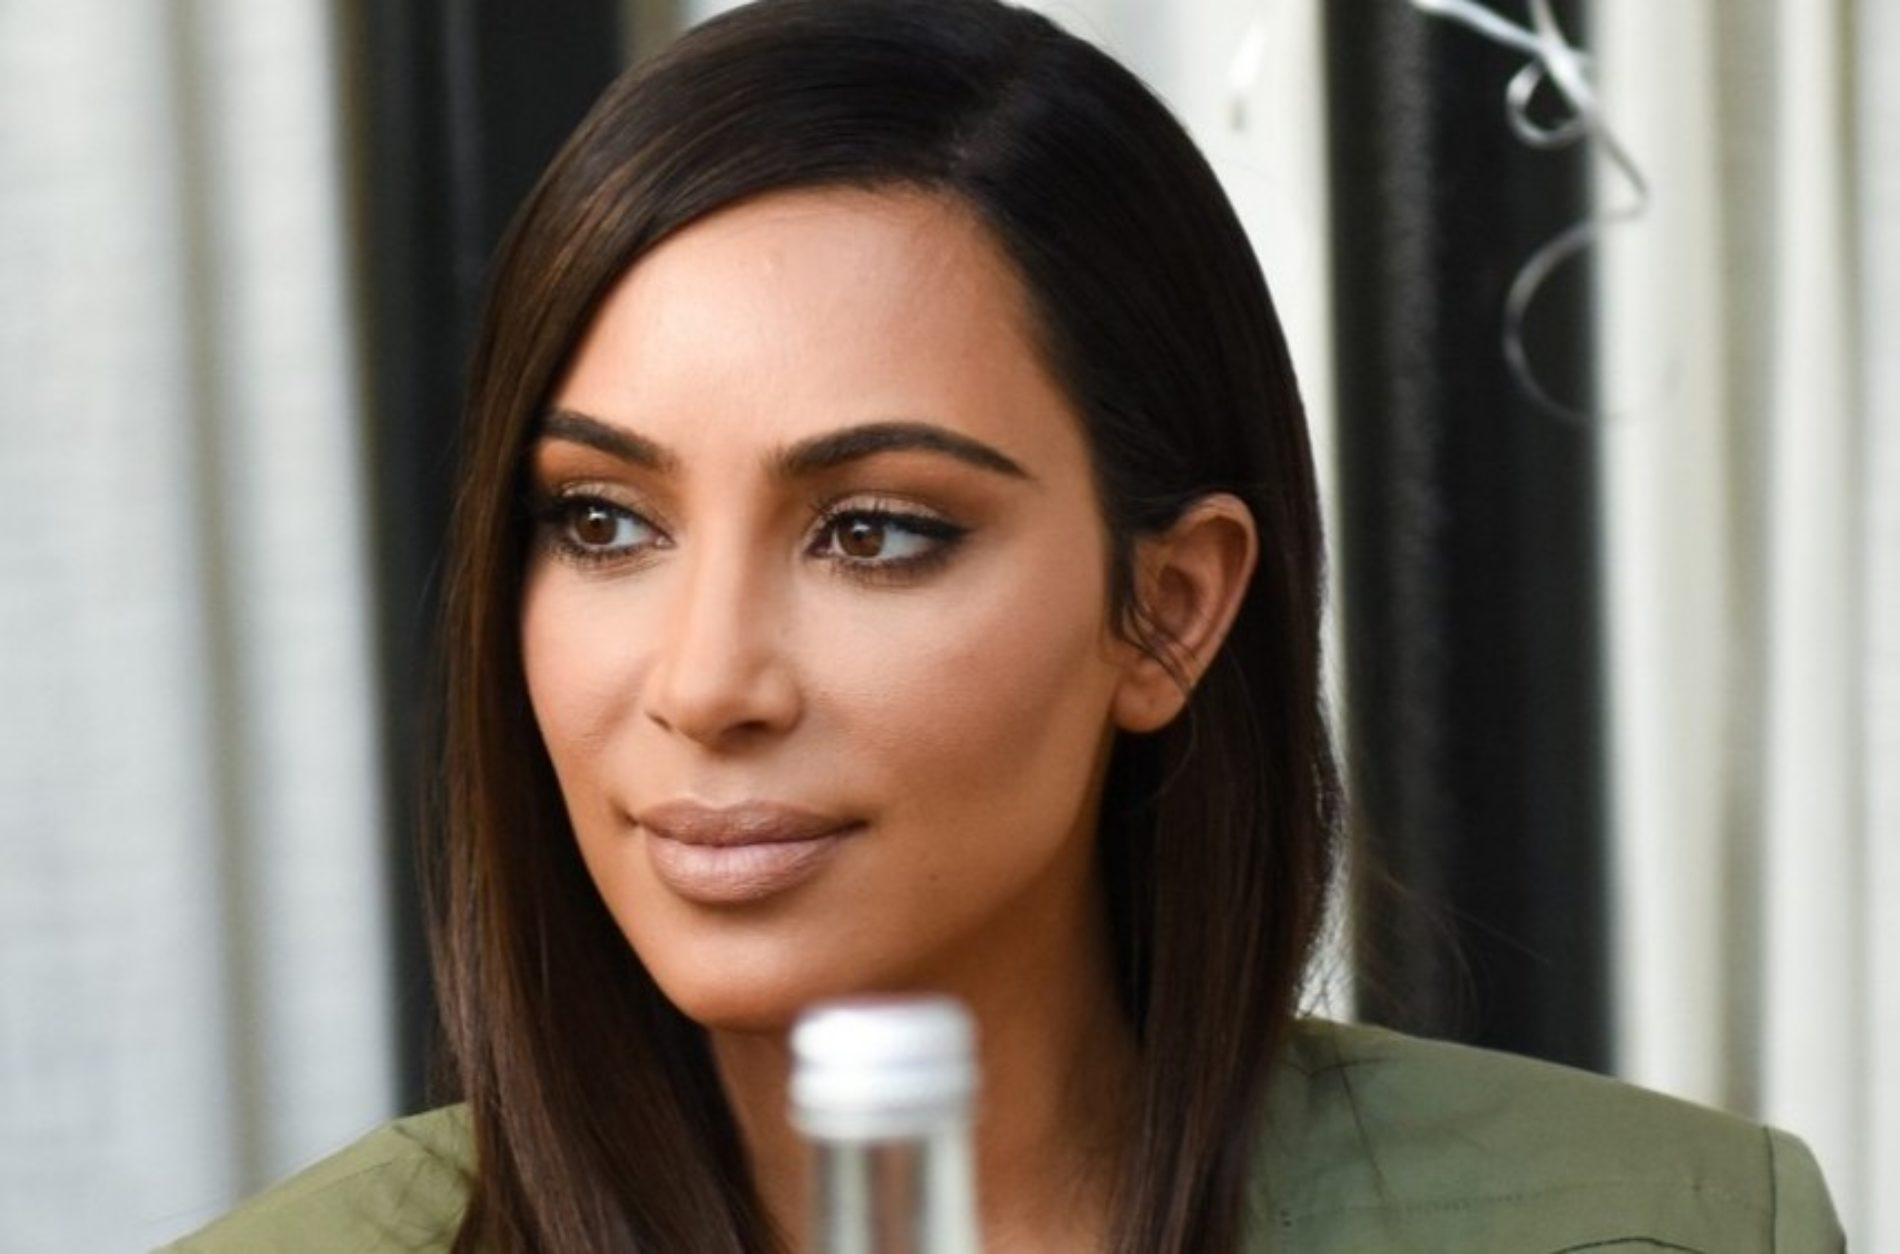 The Piece About The Dehumanization Of Kim Kardashian